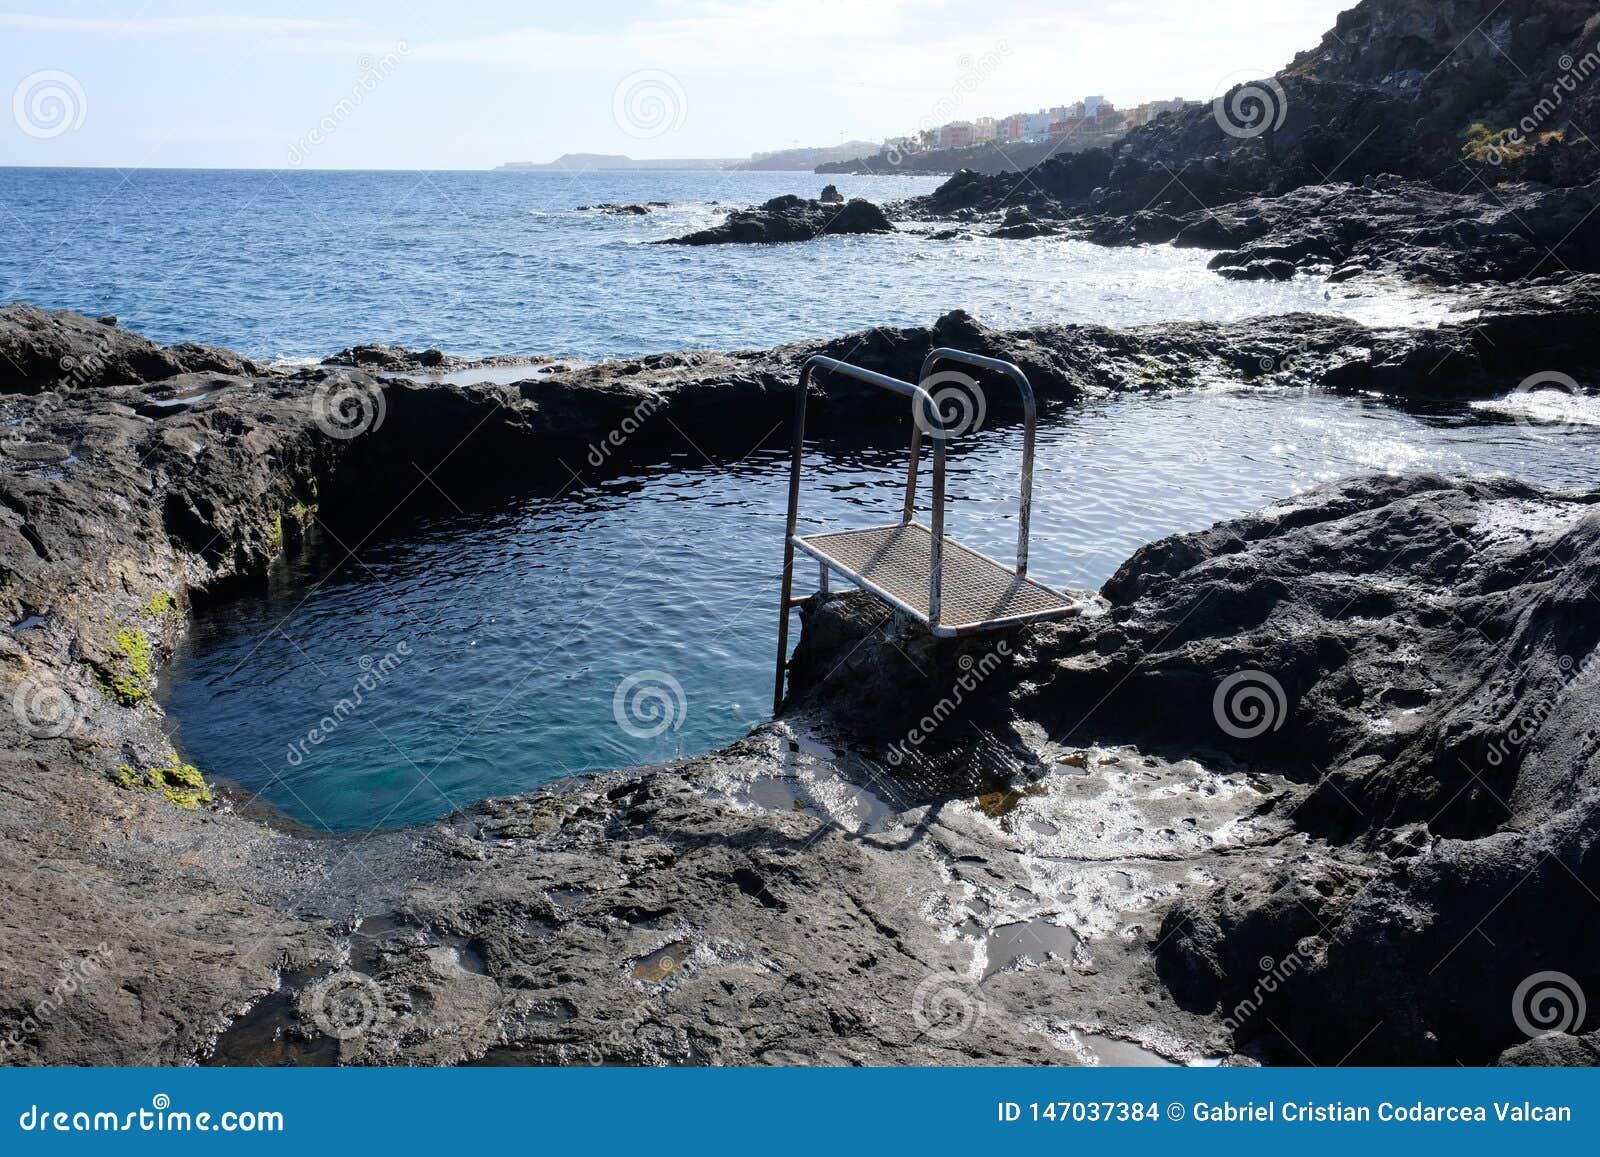 Natural pool on volcanic rocks shore